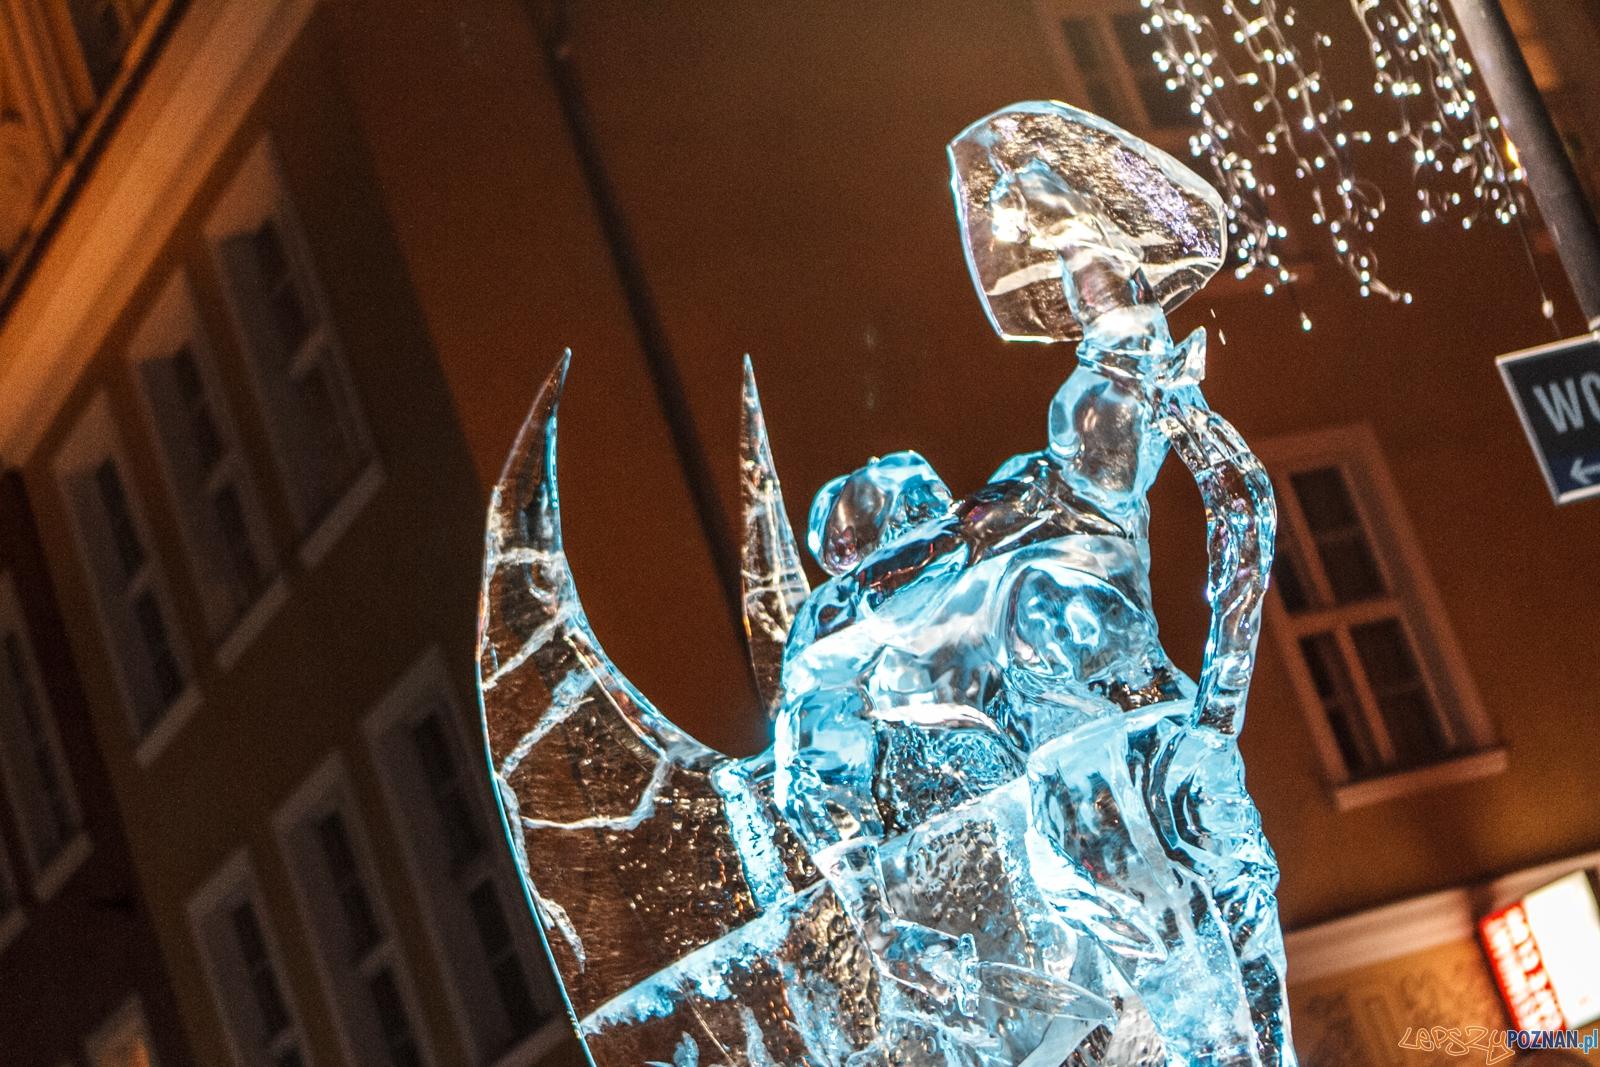 STIHL POZnan Ice Festival 2015 - 13.12.2015 r.  Foto: LepszyPOZNAN.pl / Paweł Rychter